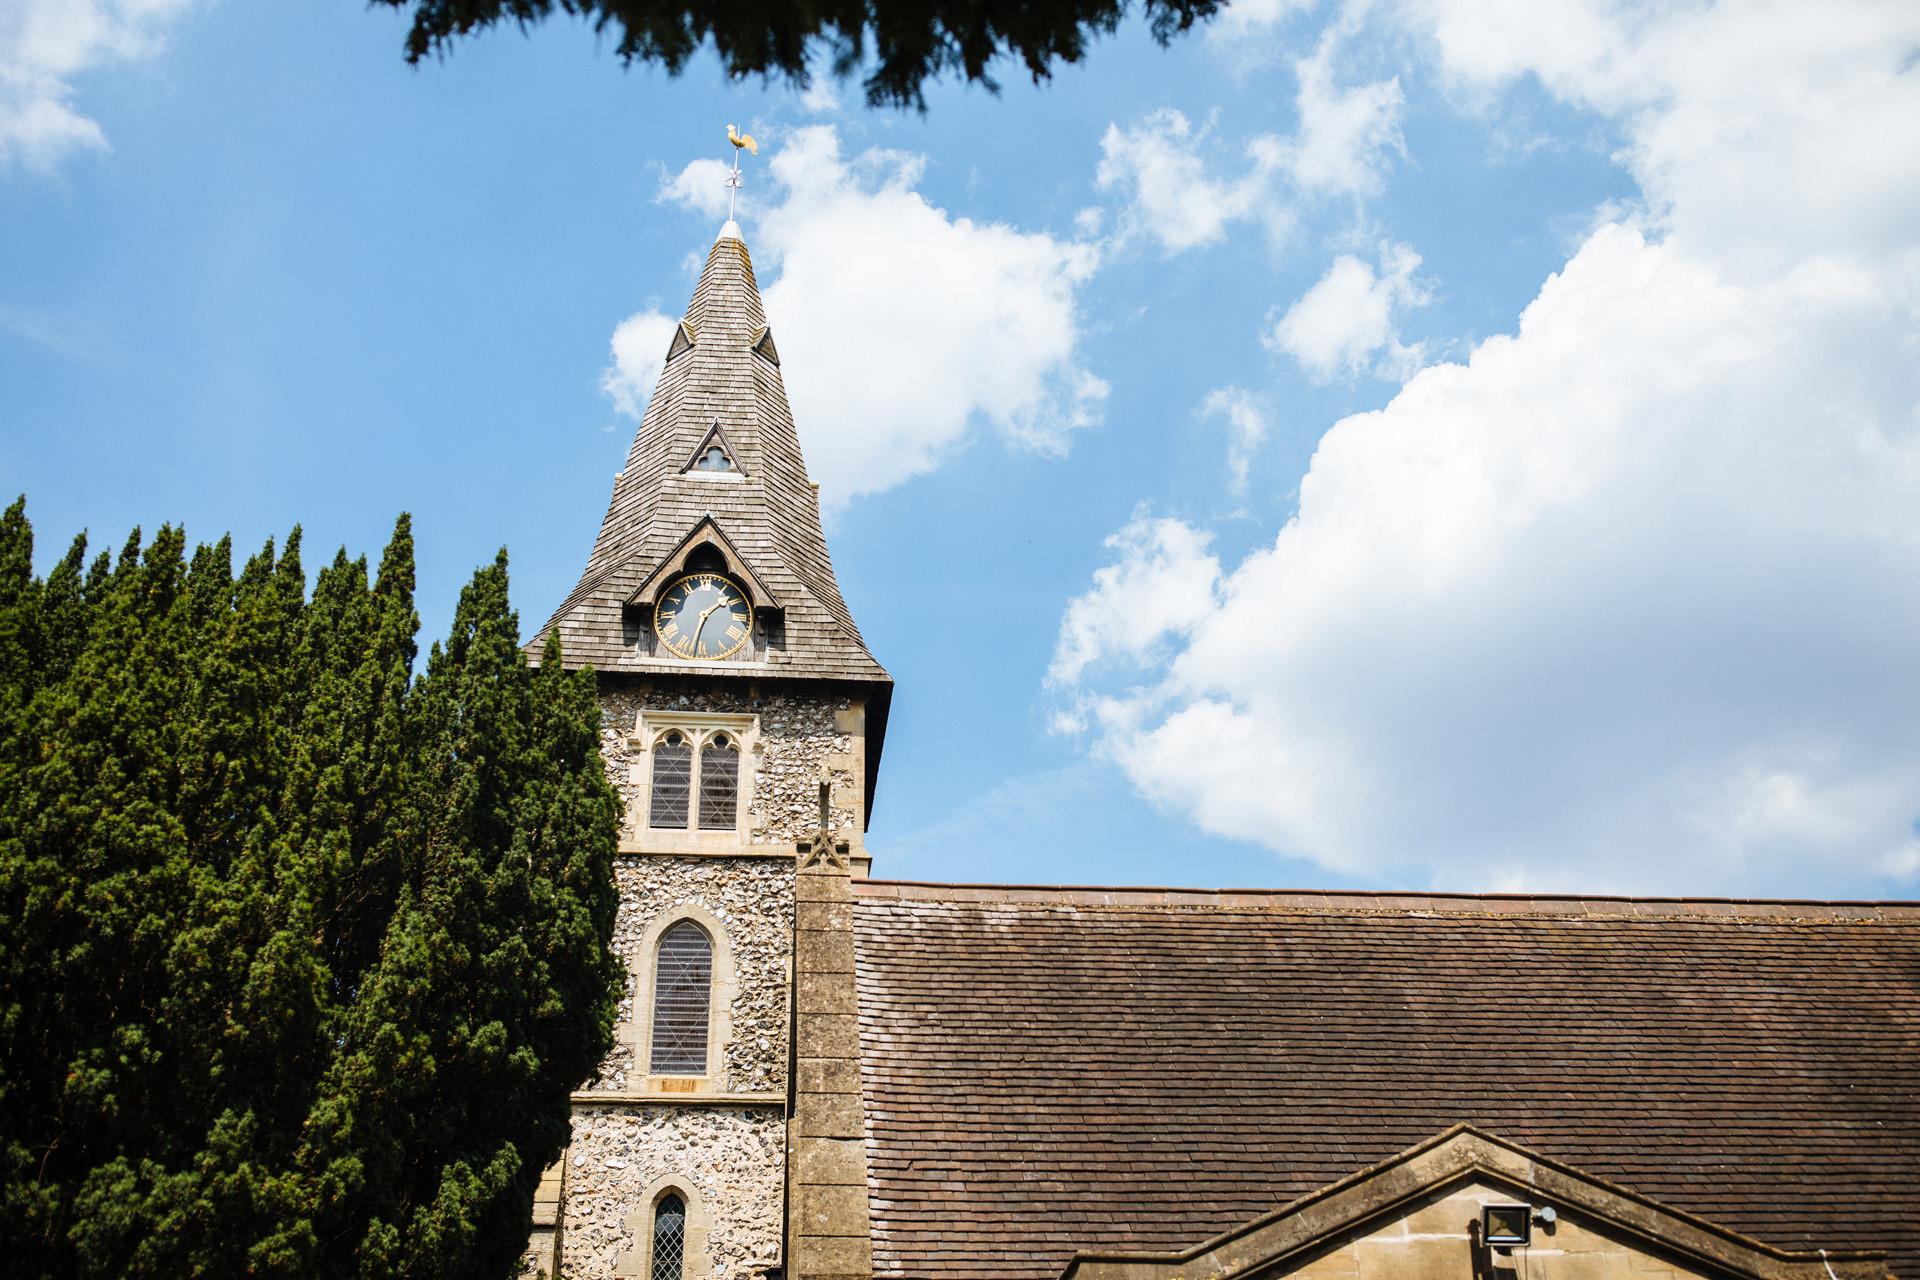 church spire in the sun against a blue sky